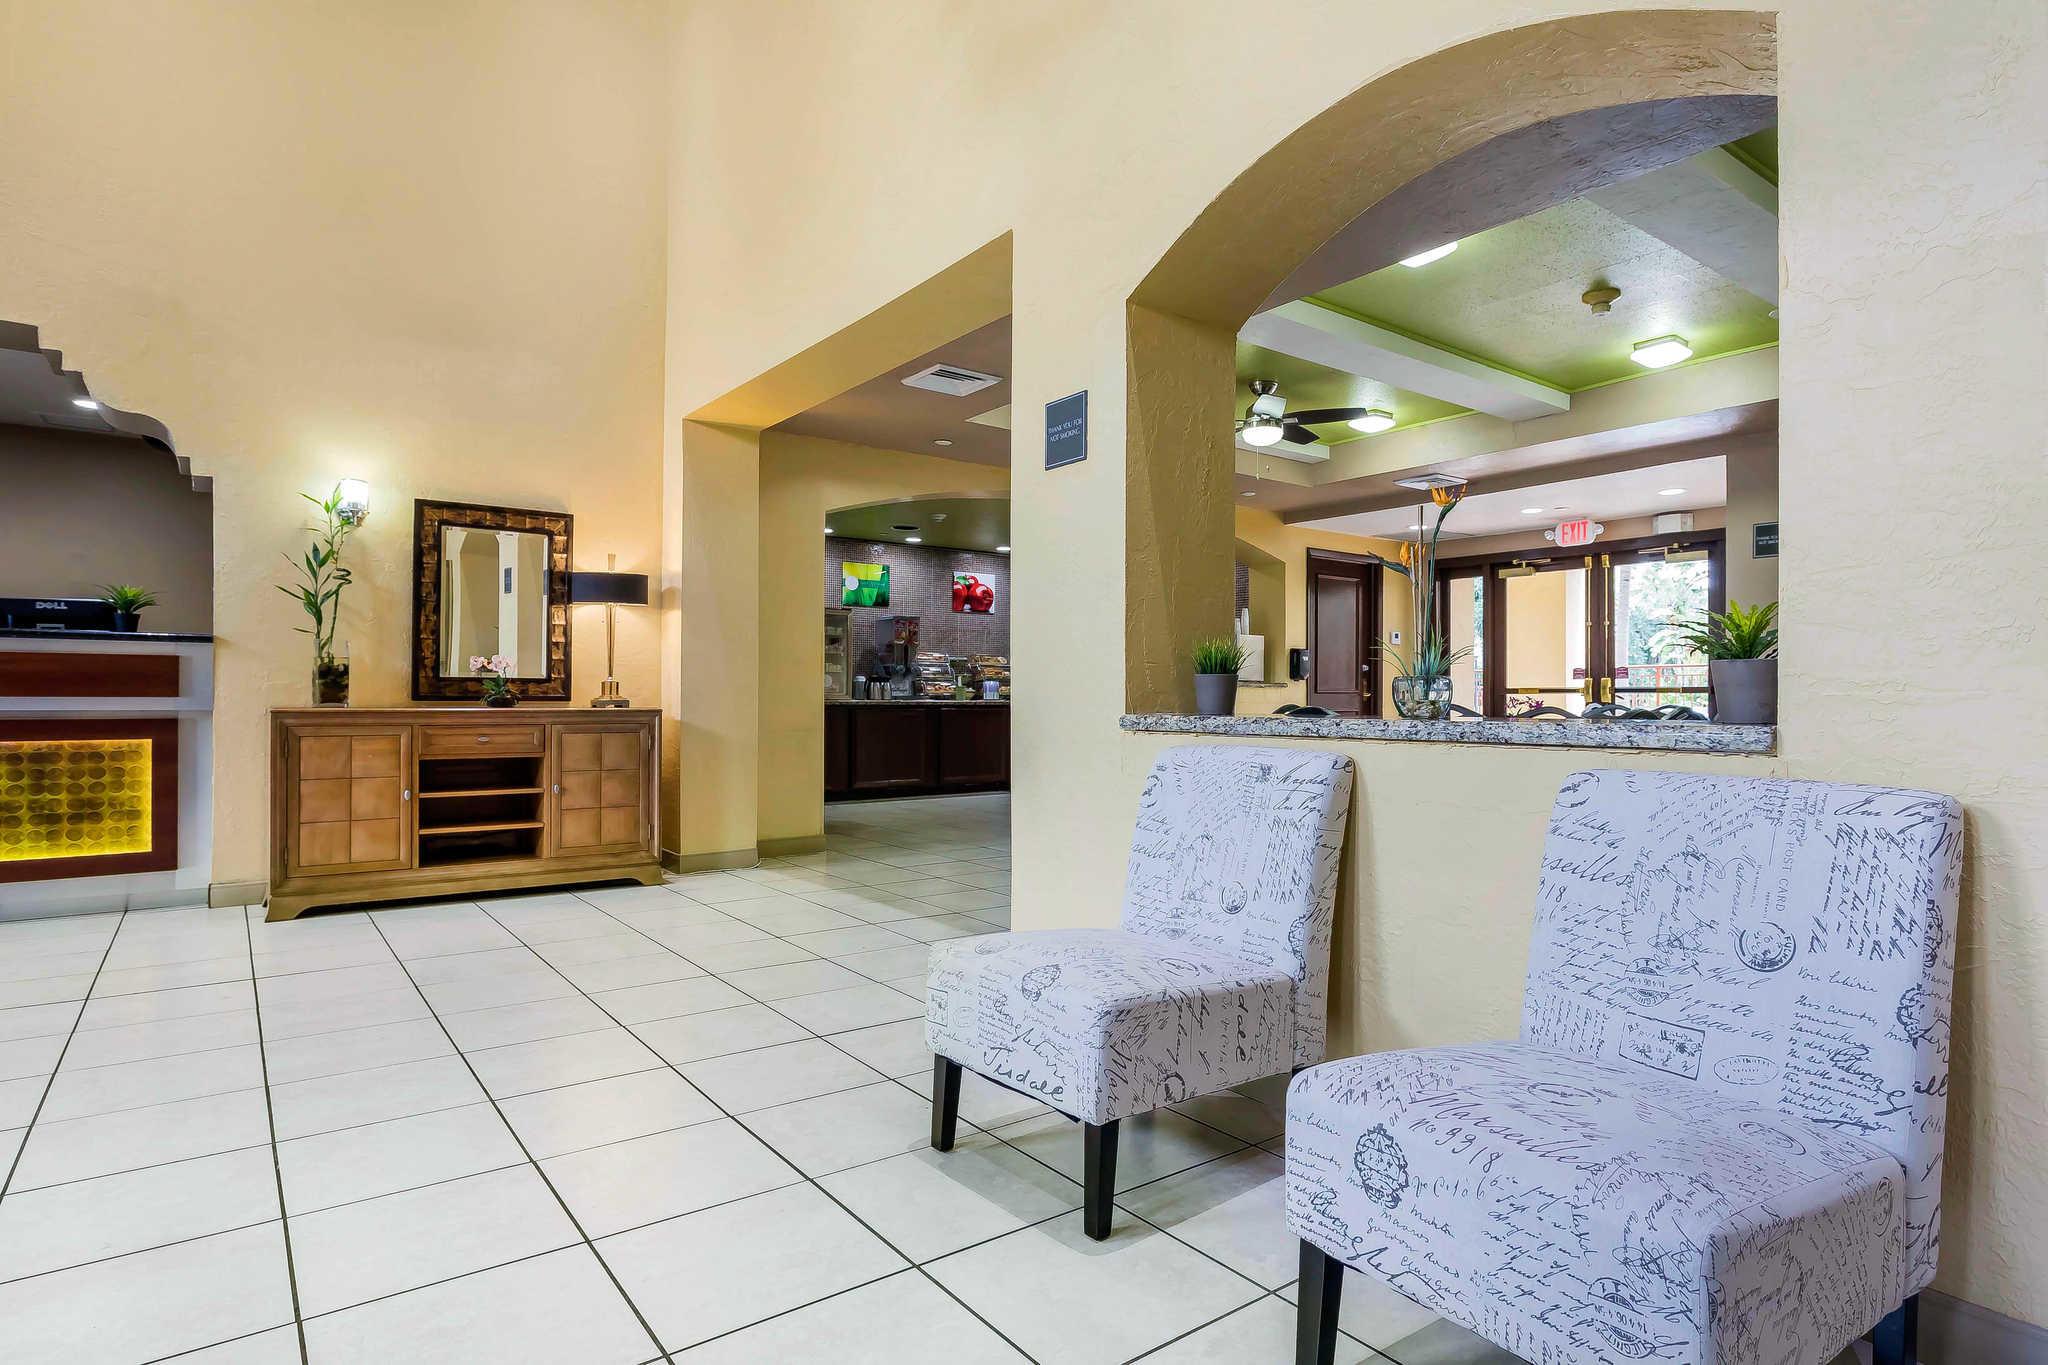 quality suites in deerfield beach fl 623 748 7. Black Bedroom Furniture Sets. Home Design Ideas